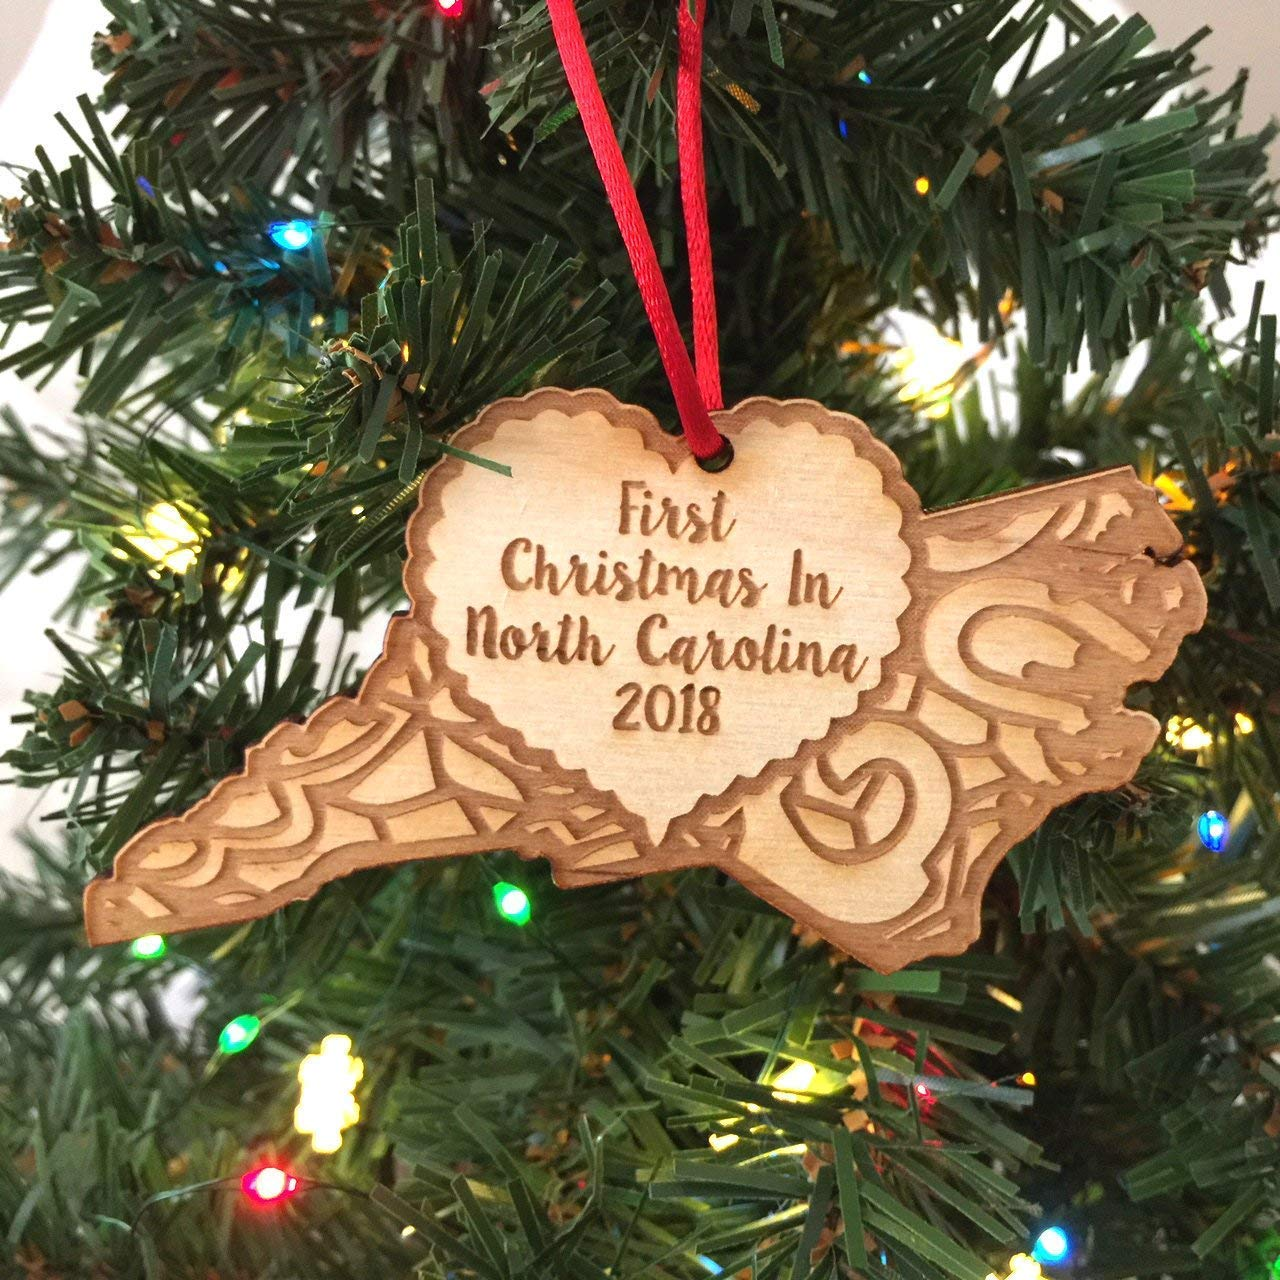 Amazon.com: First Christmas in North Carolina 2018 Christmas ...